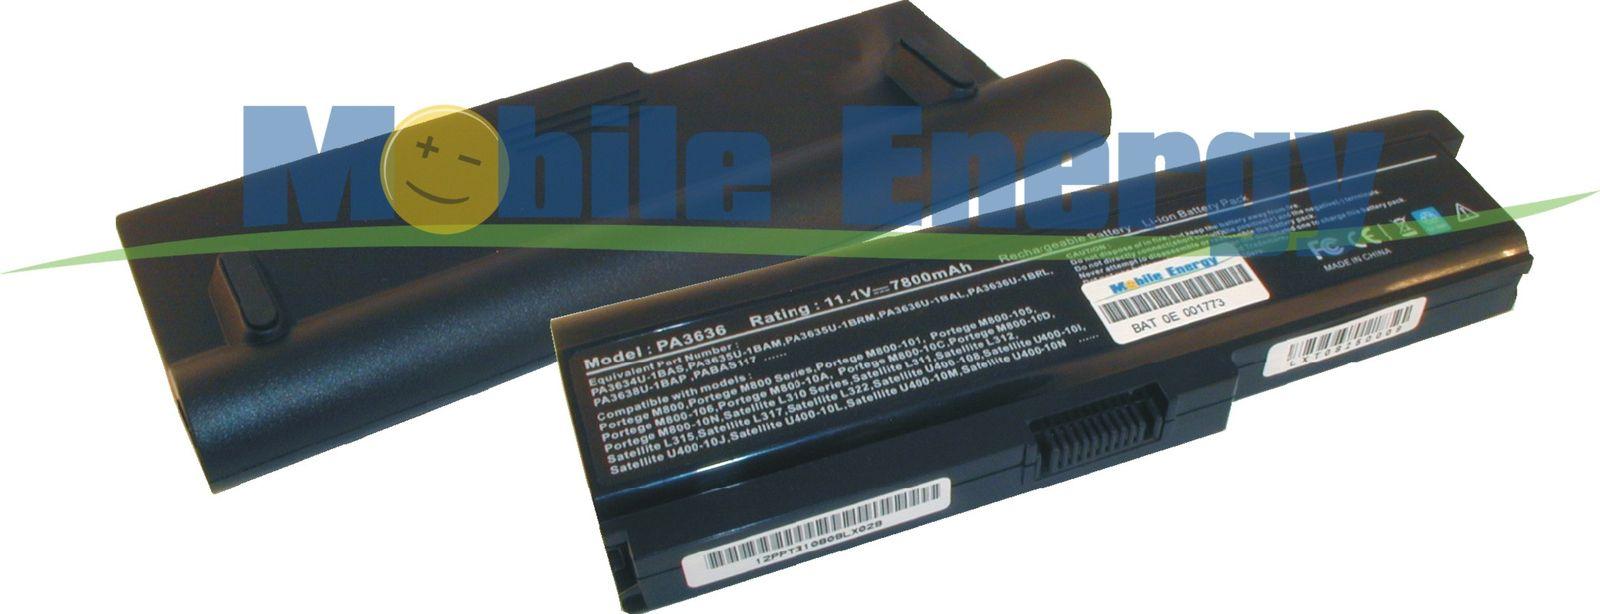 Mobile-Energy Baterie TOSHIBA Portege M800 / M810 / M820 / M830